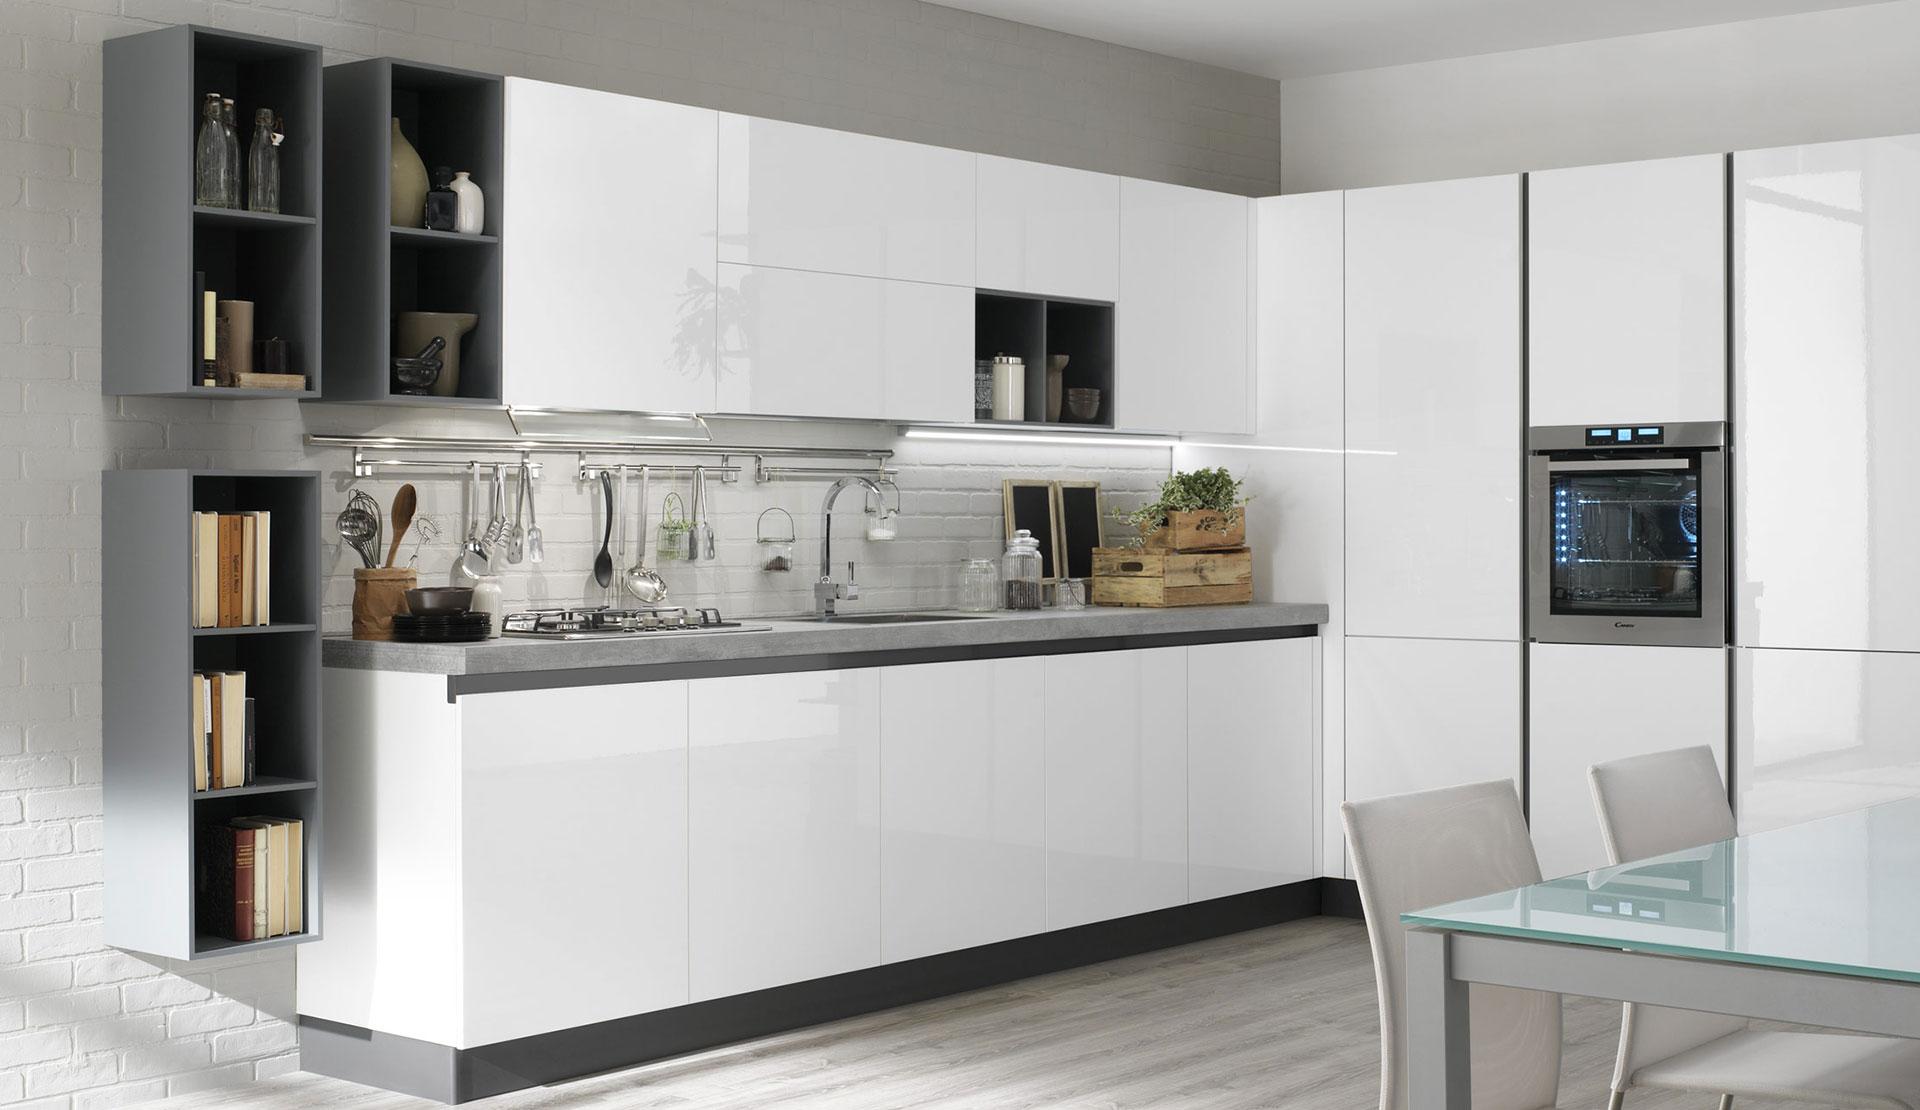 Cucina lineare o angolare evo cucine - Cucine lineari moderne ...